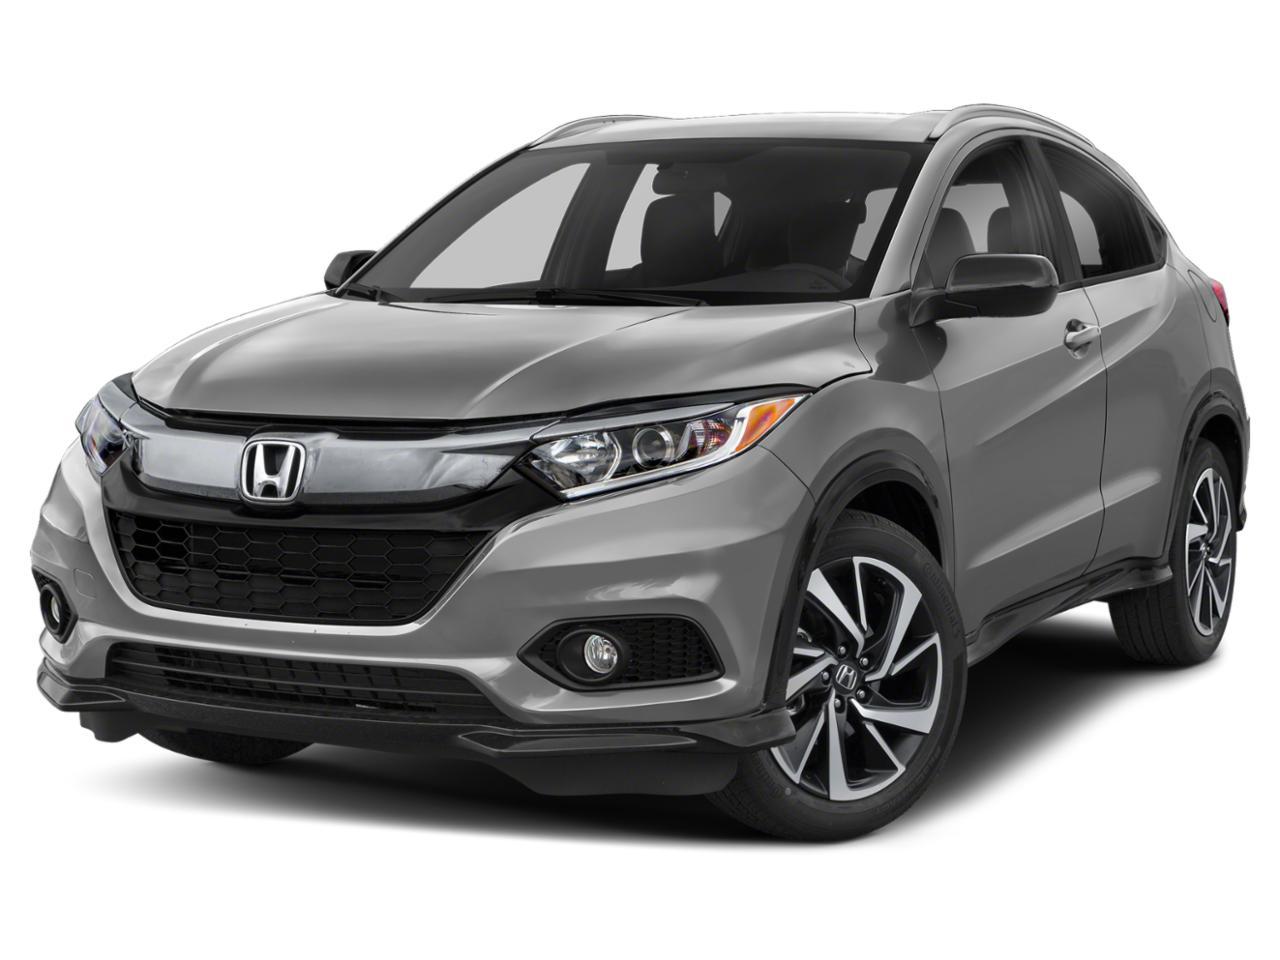 2020 Honda HR-V Vehicle Photo in EMPORIA, VA 23847-1235